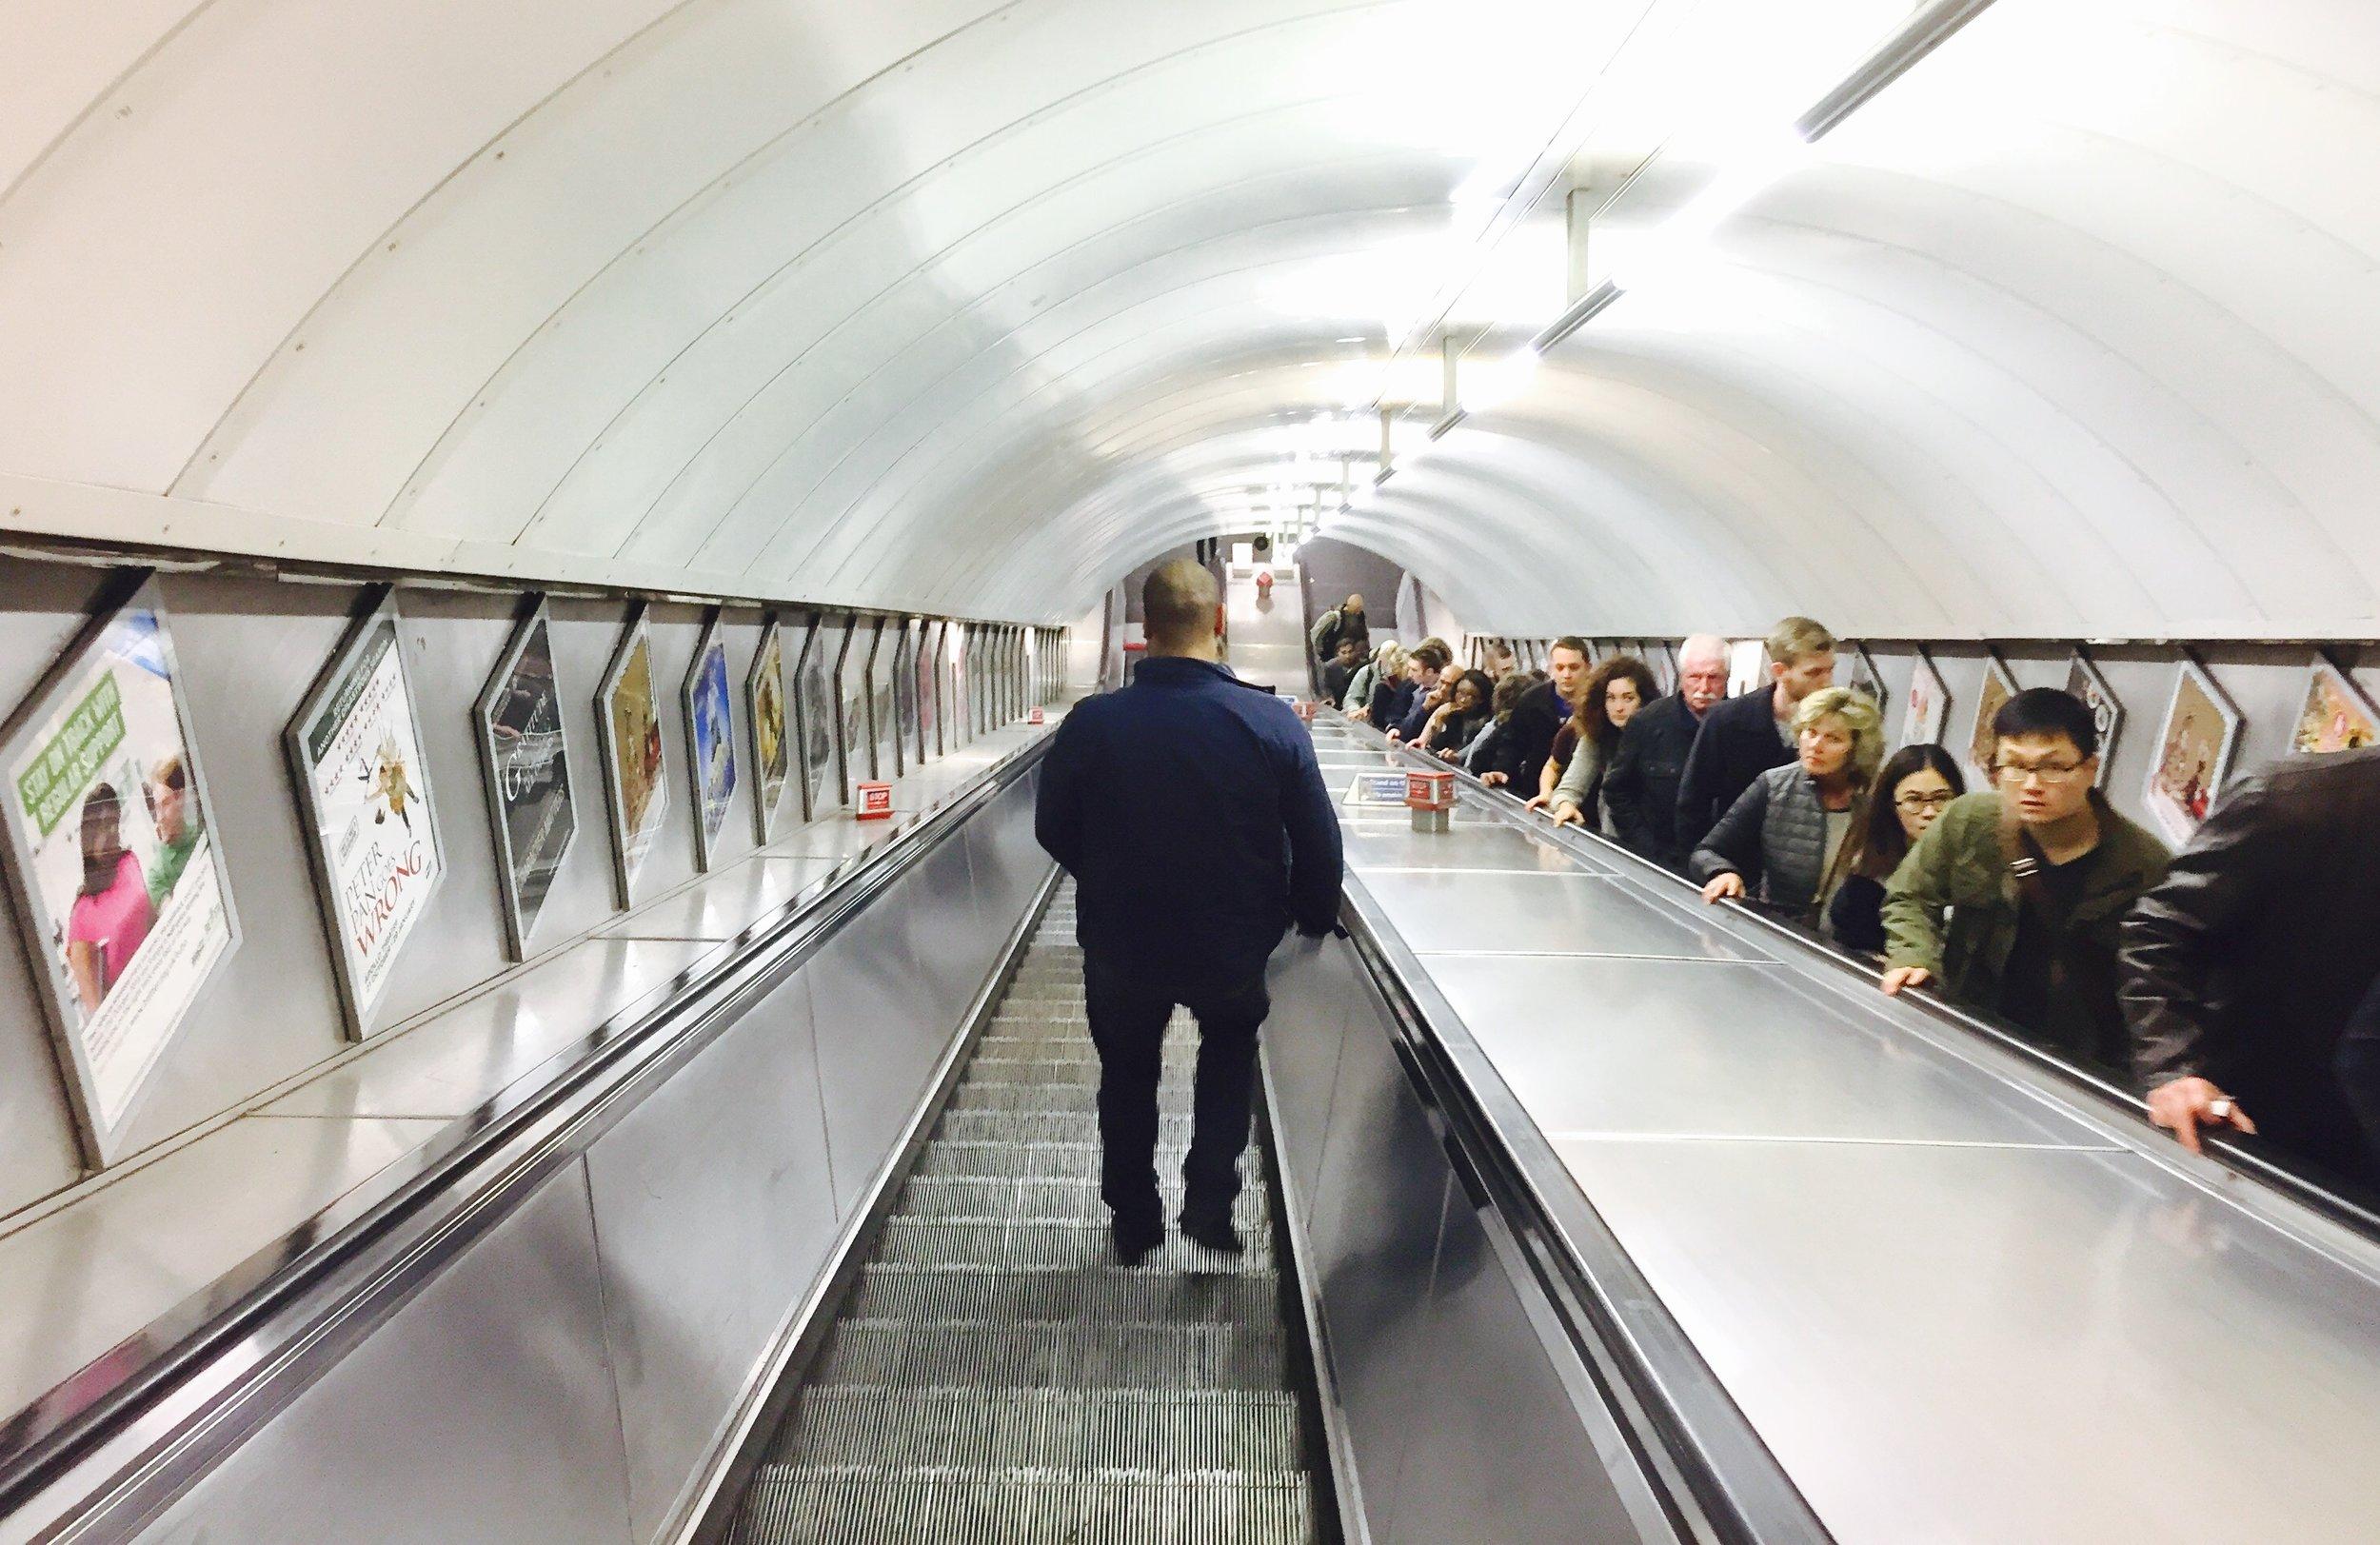 Heading underground.